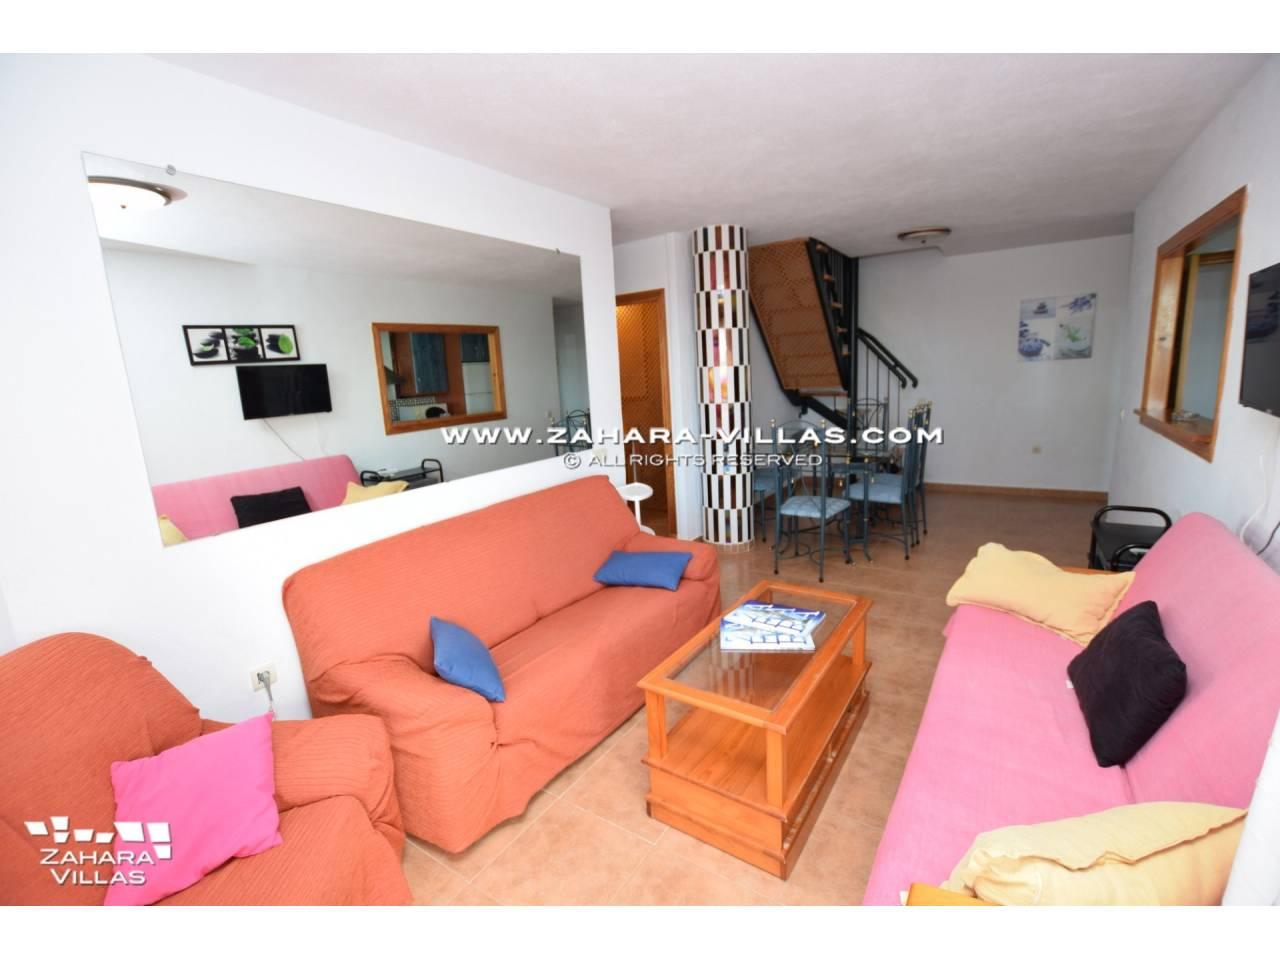 Imagen 14 de Penthouse for sale in Zahara de los Atunes